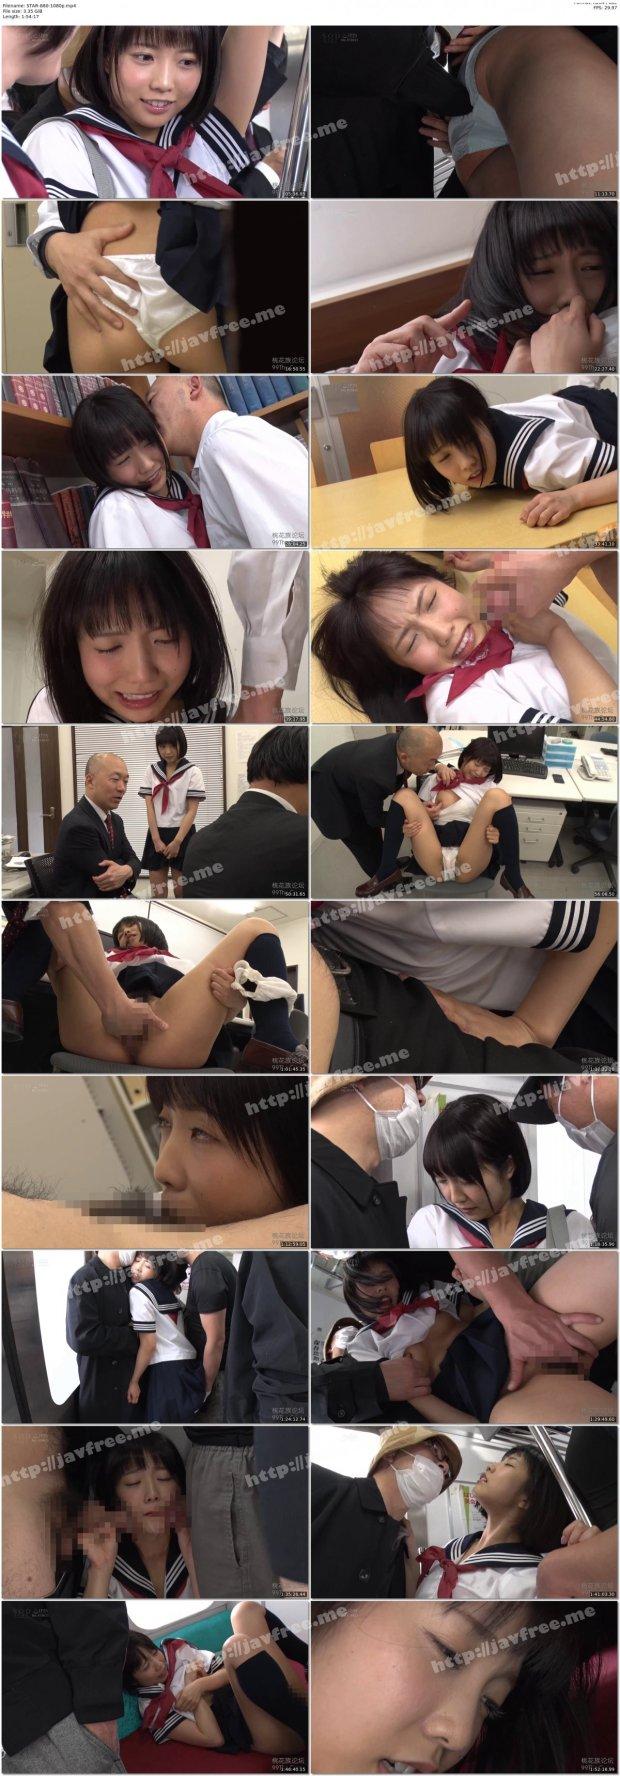 [HD][STAR-880] 戸田真琴 大学受験を控えた女子●生痴漢